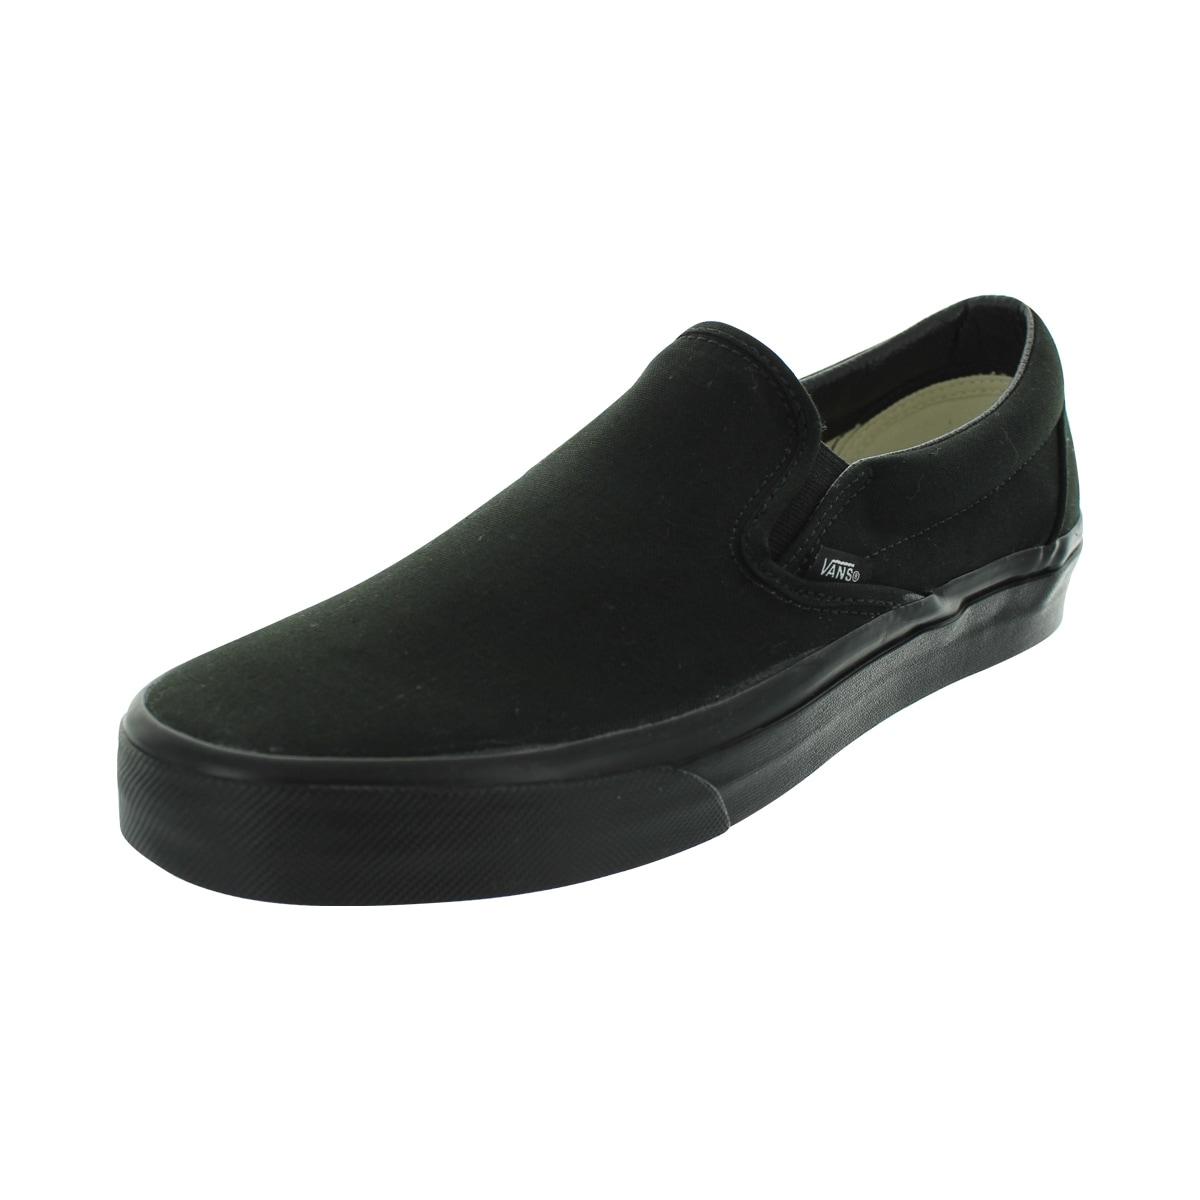 Vans Men's Black Canvas Classic Slip-on Skate Shoes (5.5)